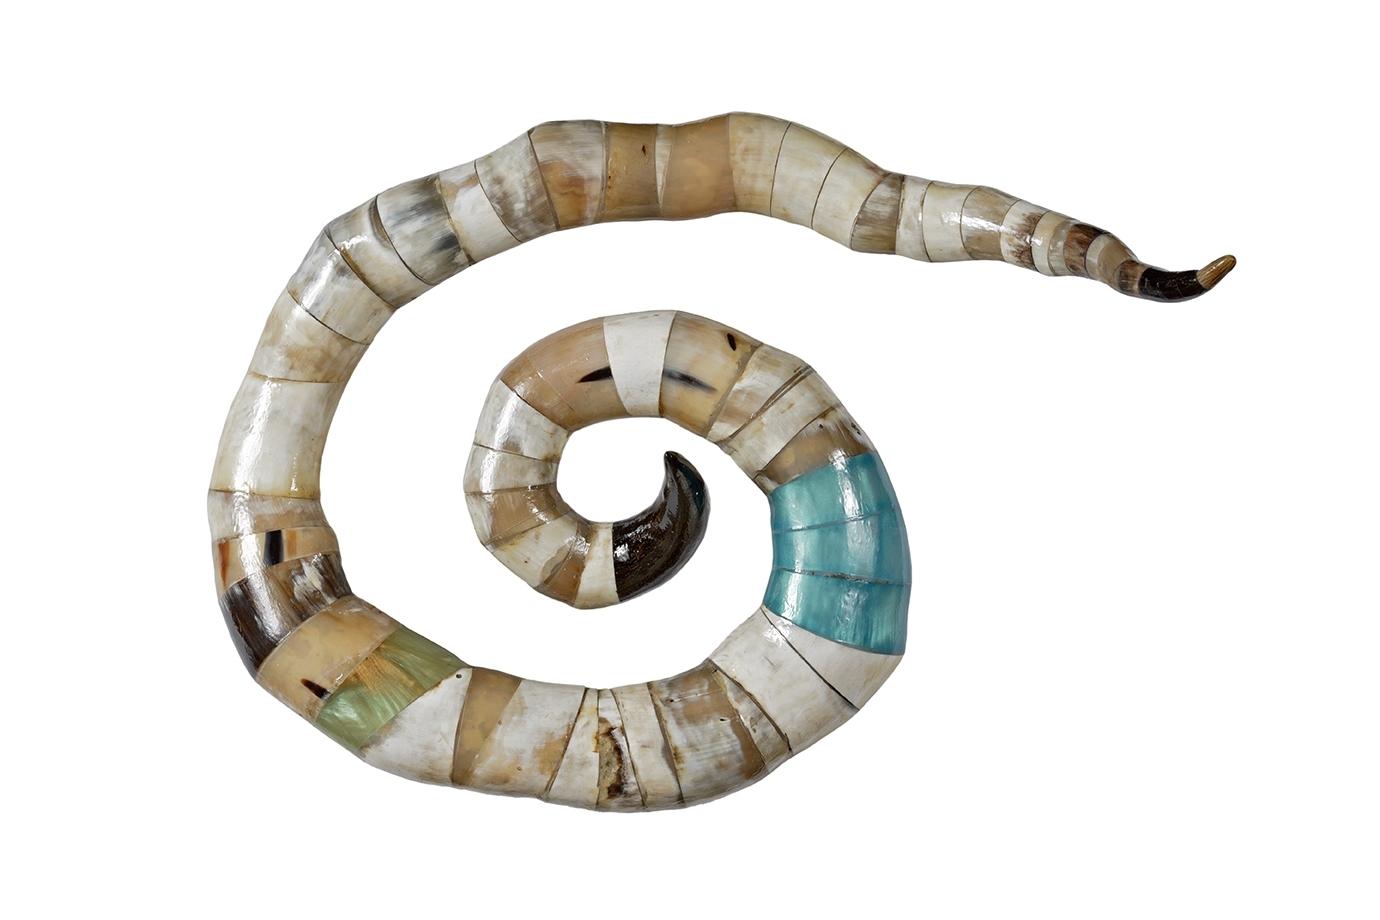 Serpentine III image